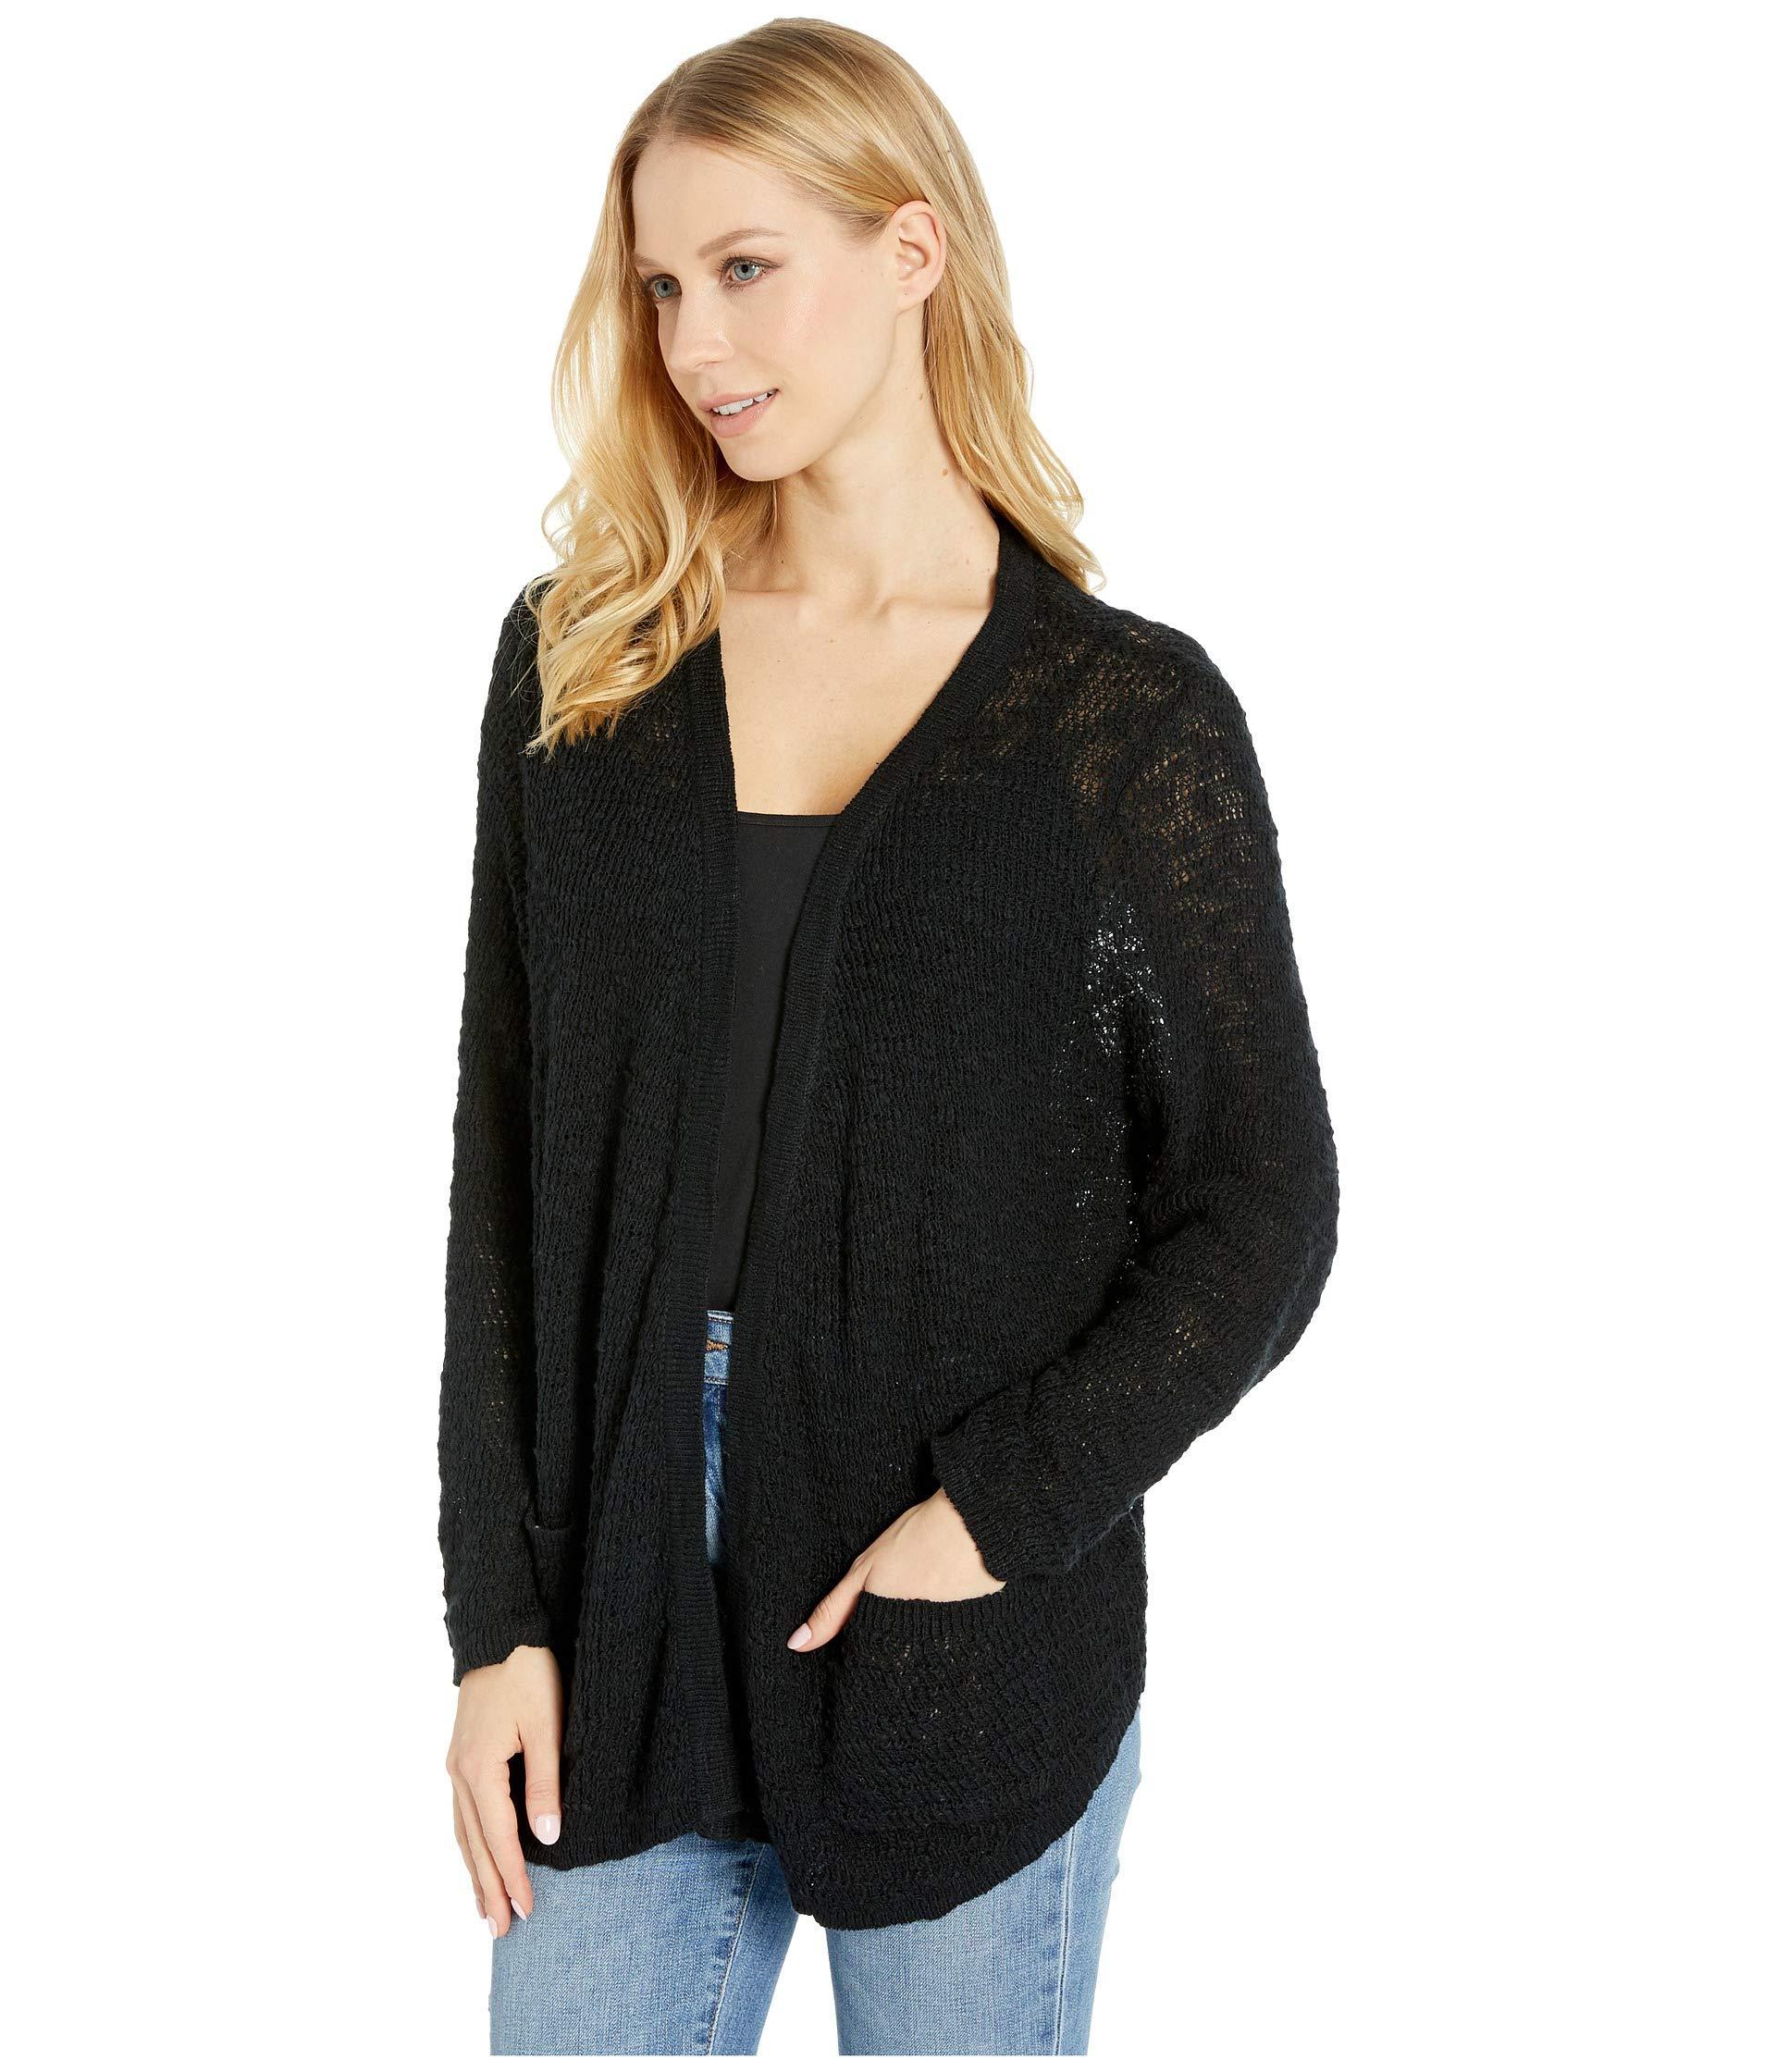 094035bec4 Lyst - Roxy Liberty Discover Cardigan (true Black) Women s Sweater in Black